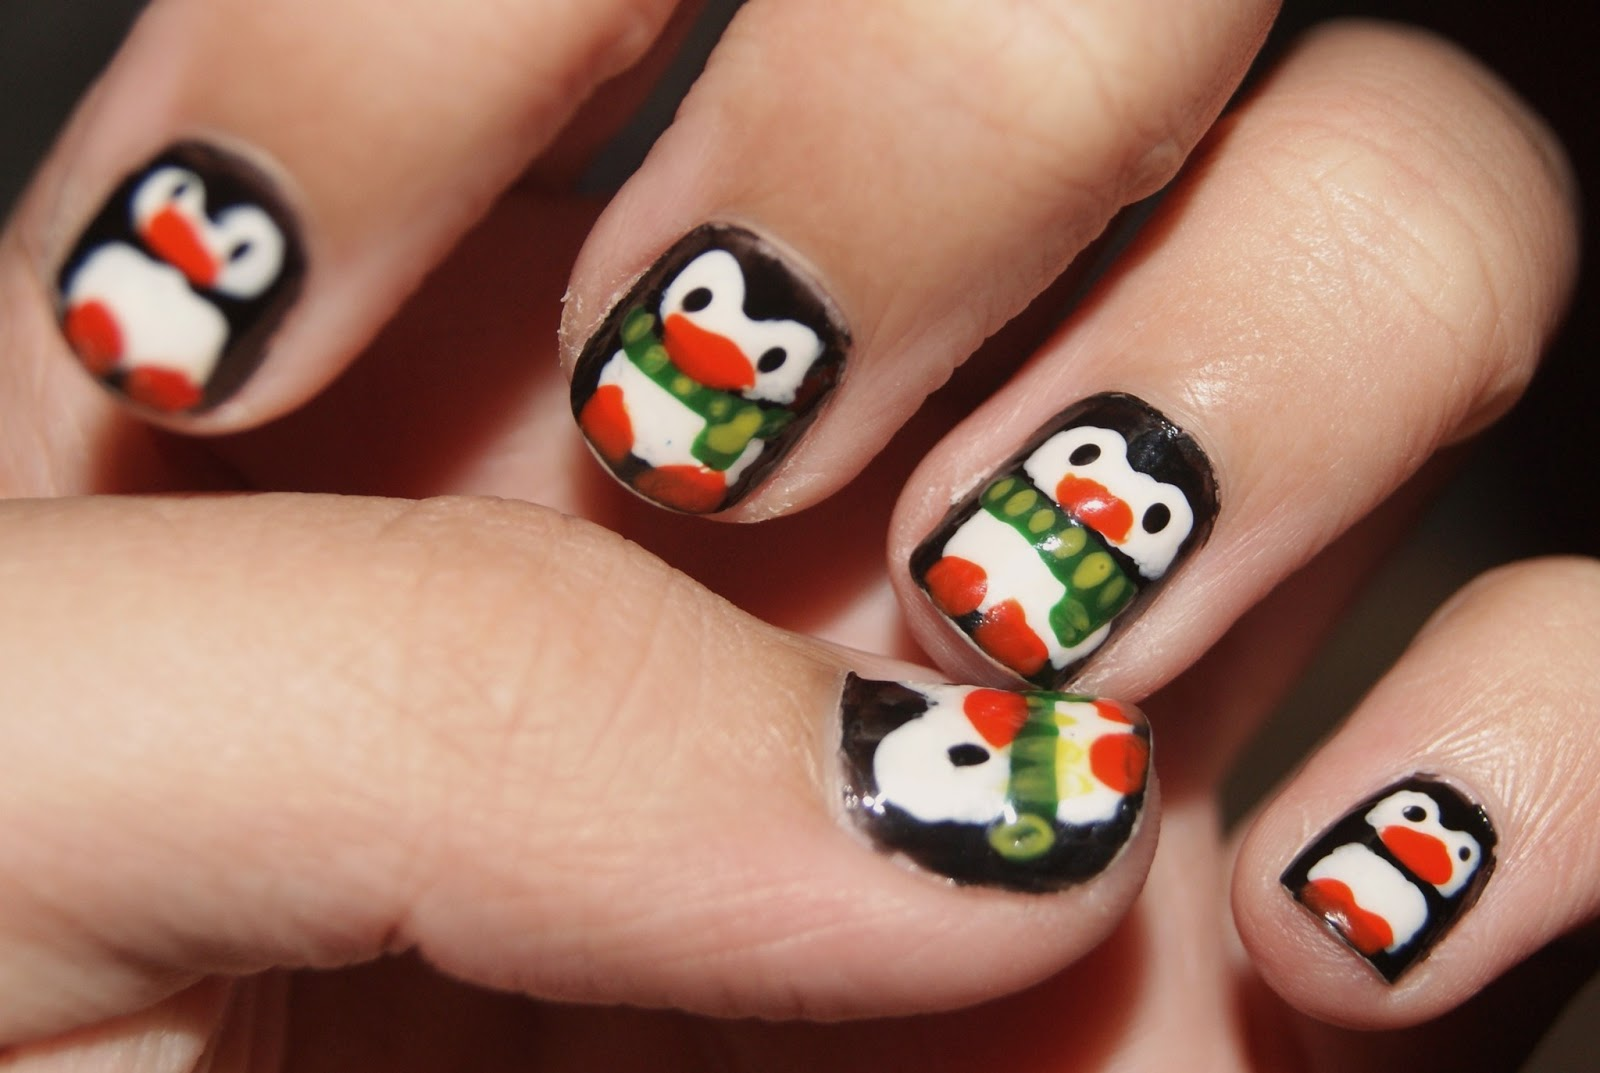 CmoJ's Nail Art: Winter Penguin Design